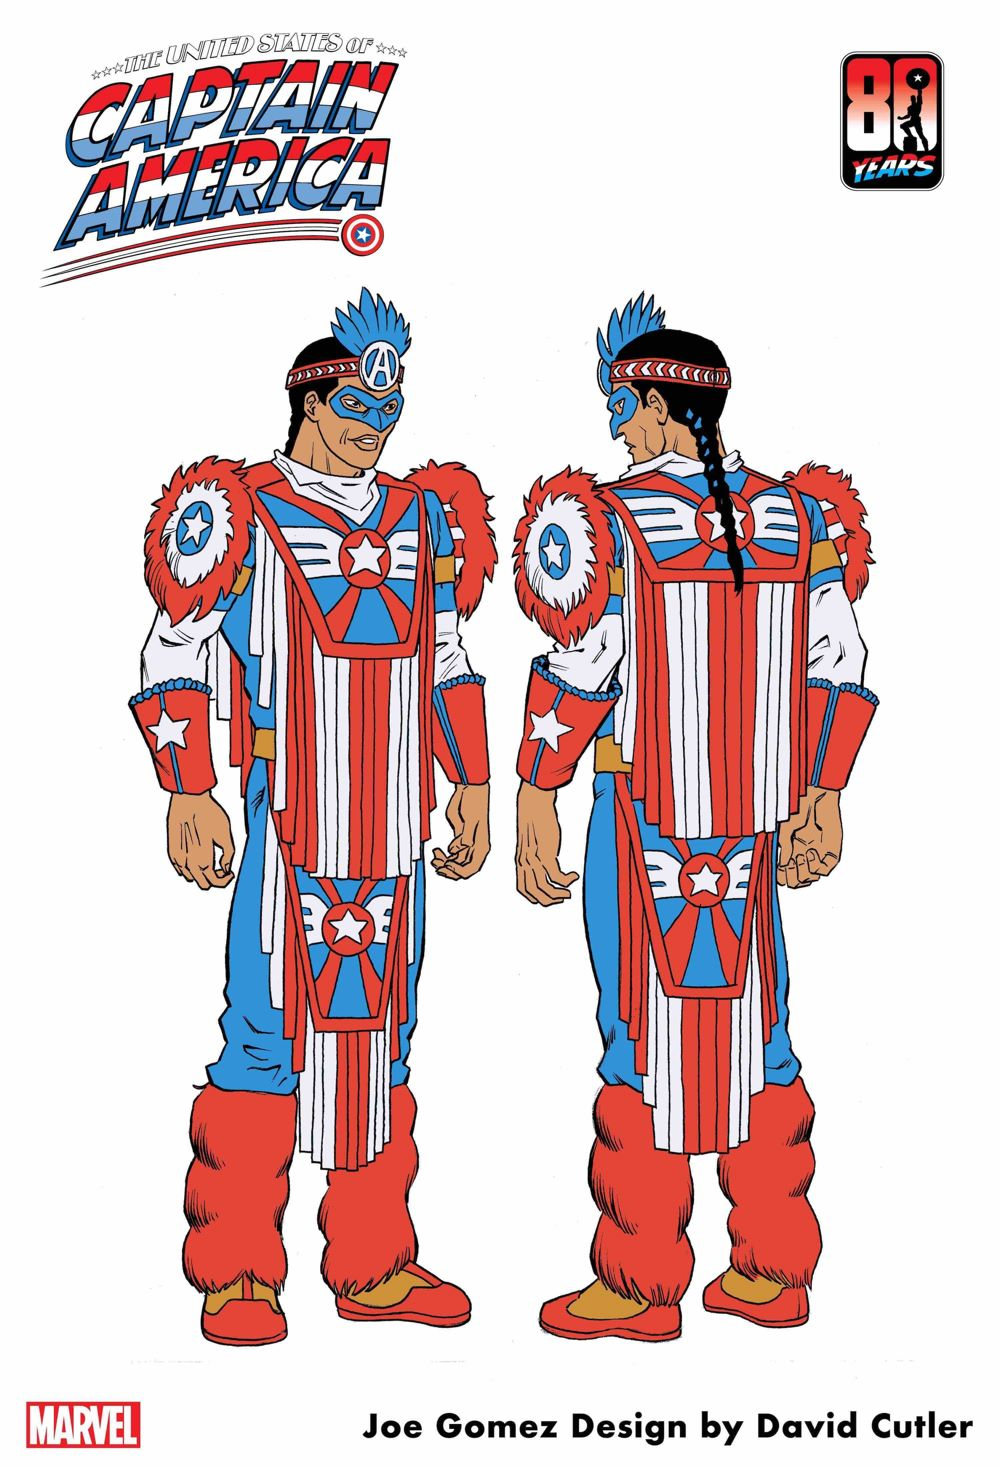 Joe-Gomez THE UNITED STATES OF CAPTAIN AMERICA #3 introduces Kickapoo Tribe character